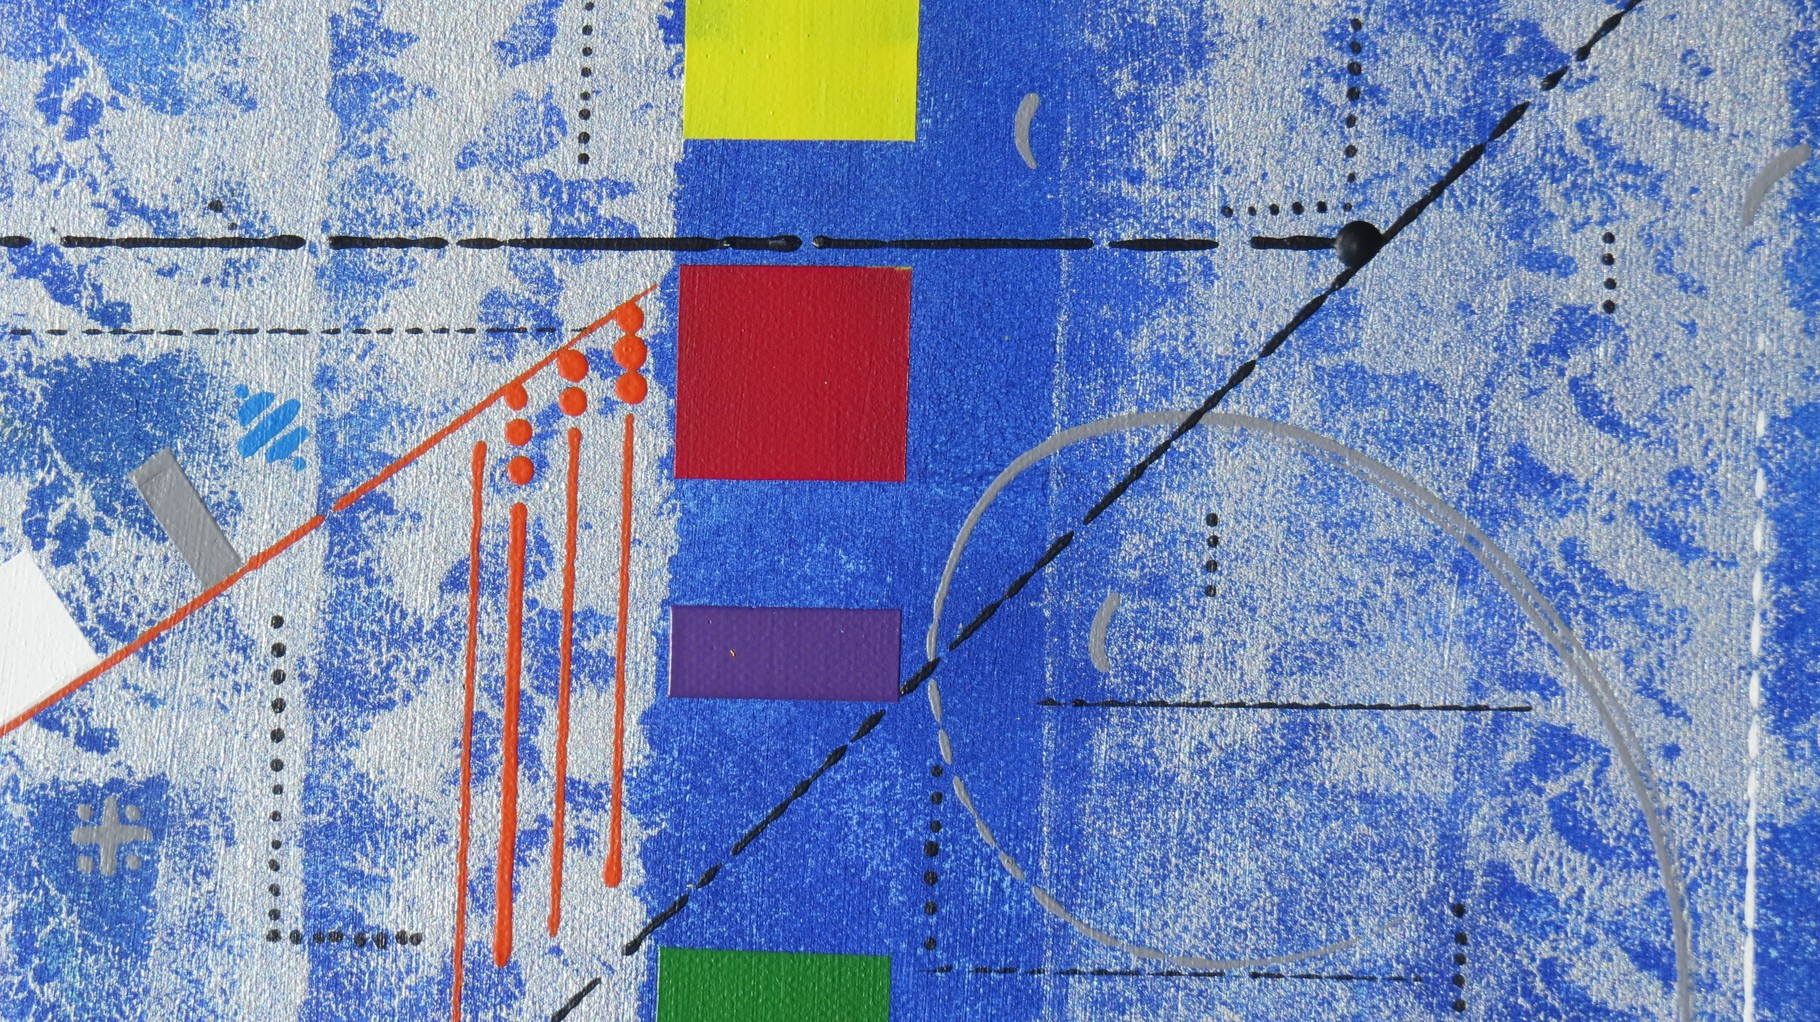 confins.zoom4 - daluz galego peinture tableau abstrait abstraction